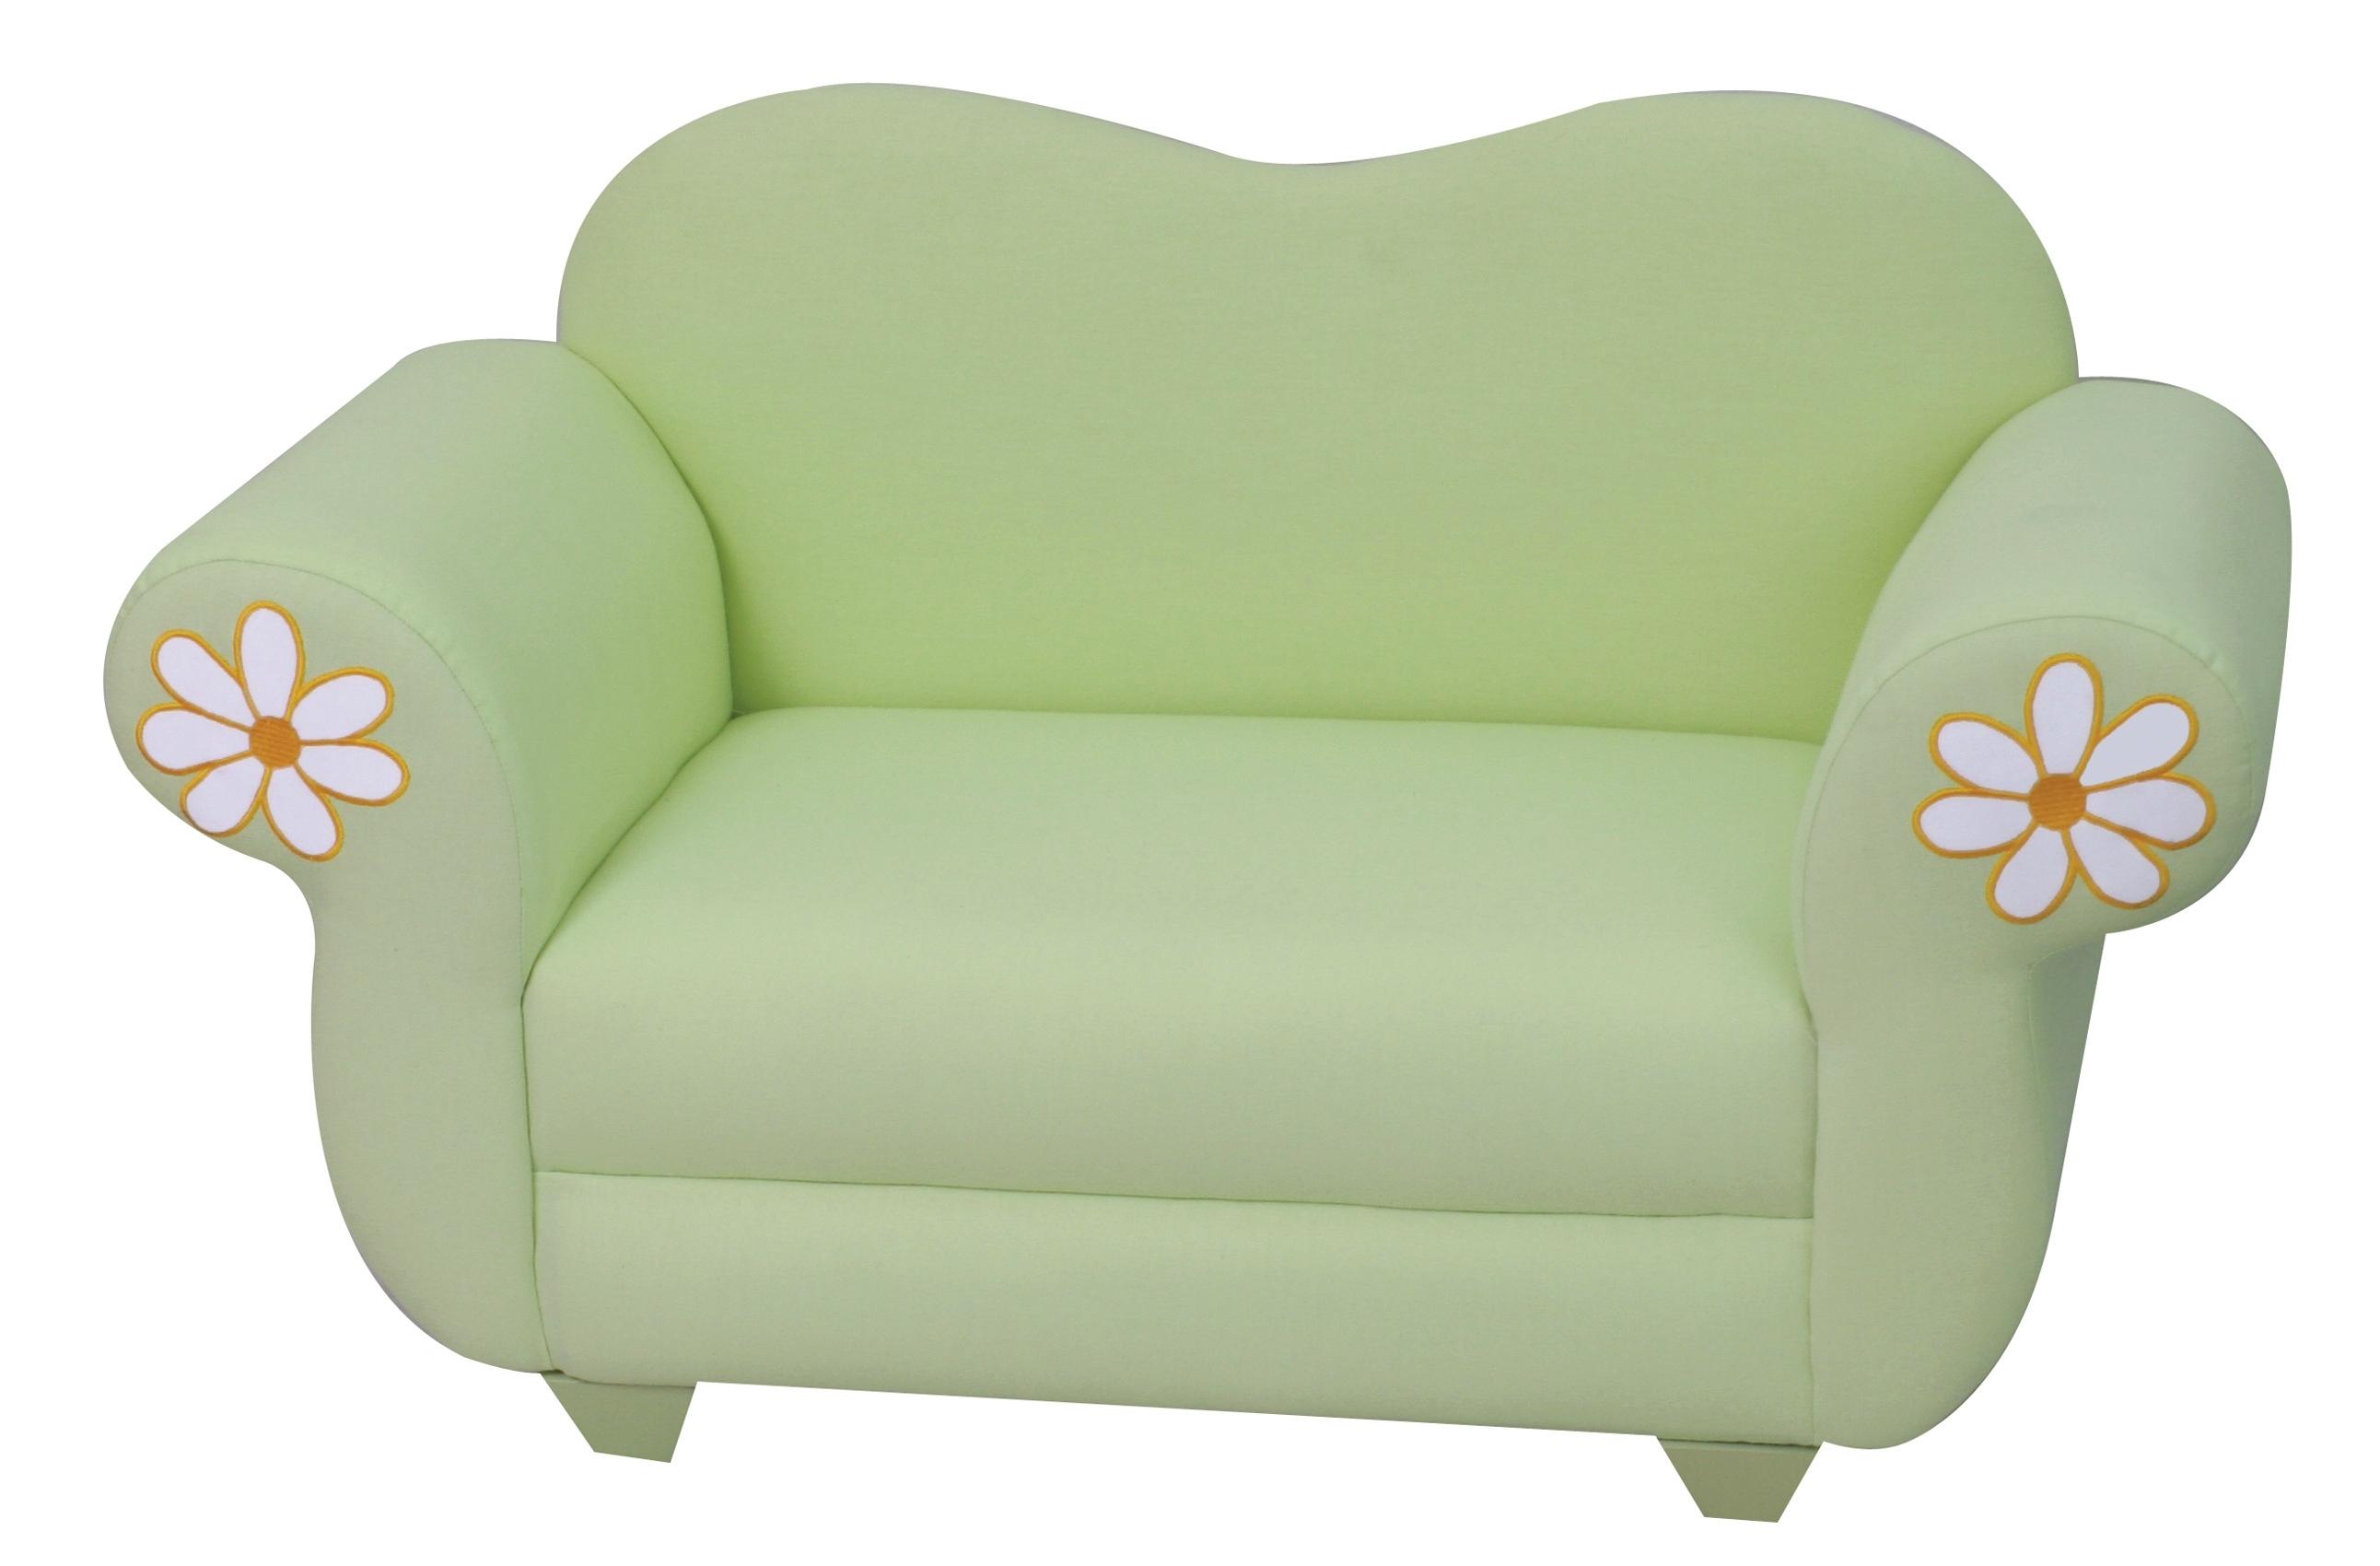 Fashionable Furniture Home: Ikea Kids Sofa With Bedroom Sofas And Chairs For Bedroom Sofas And Chairs (View 10 of 15)